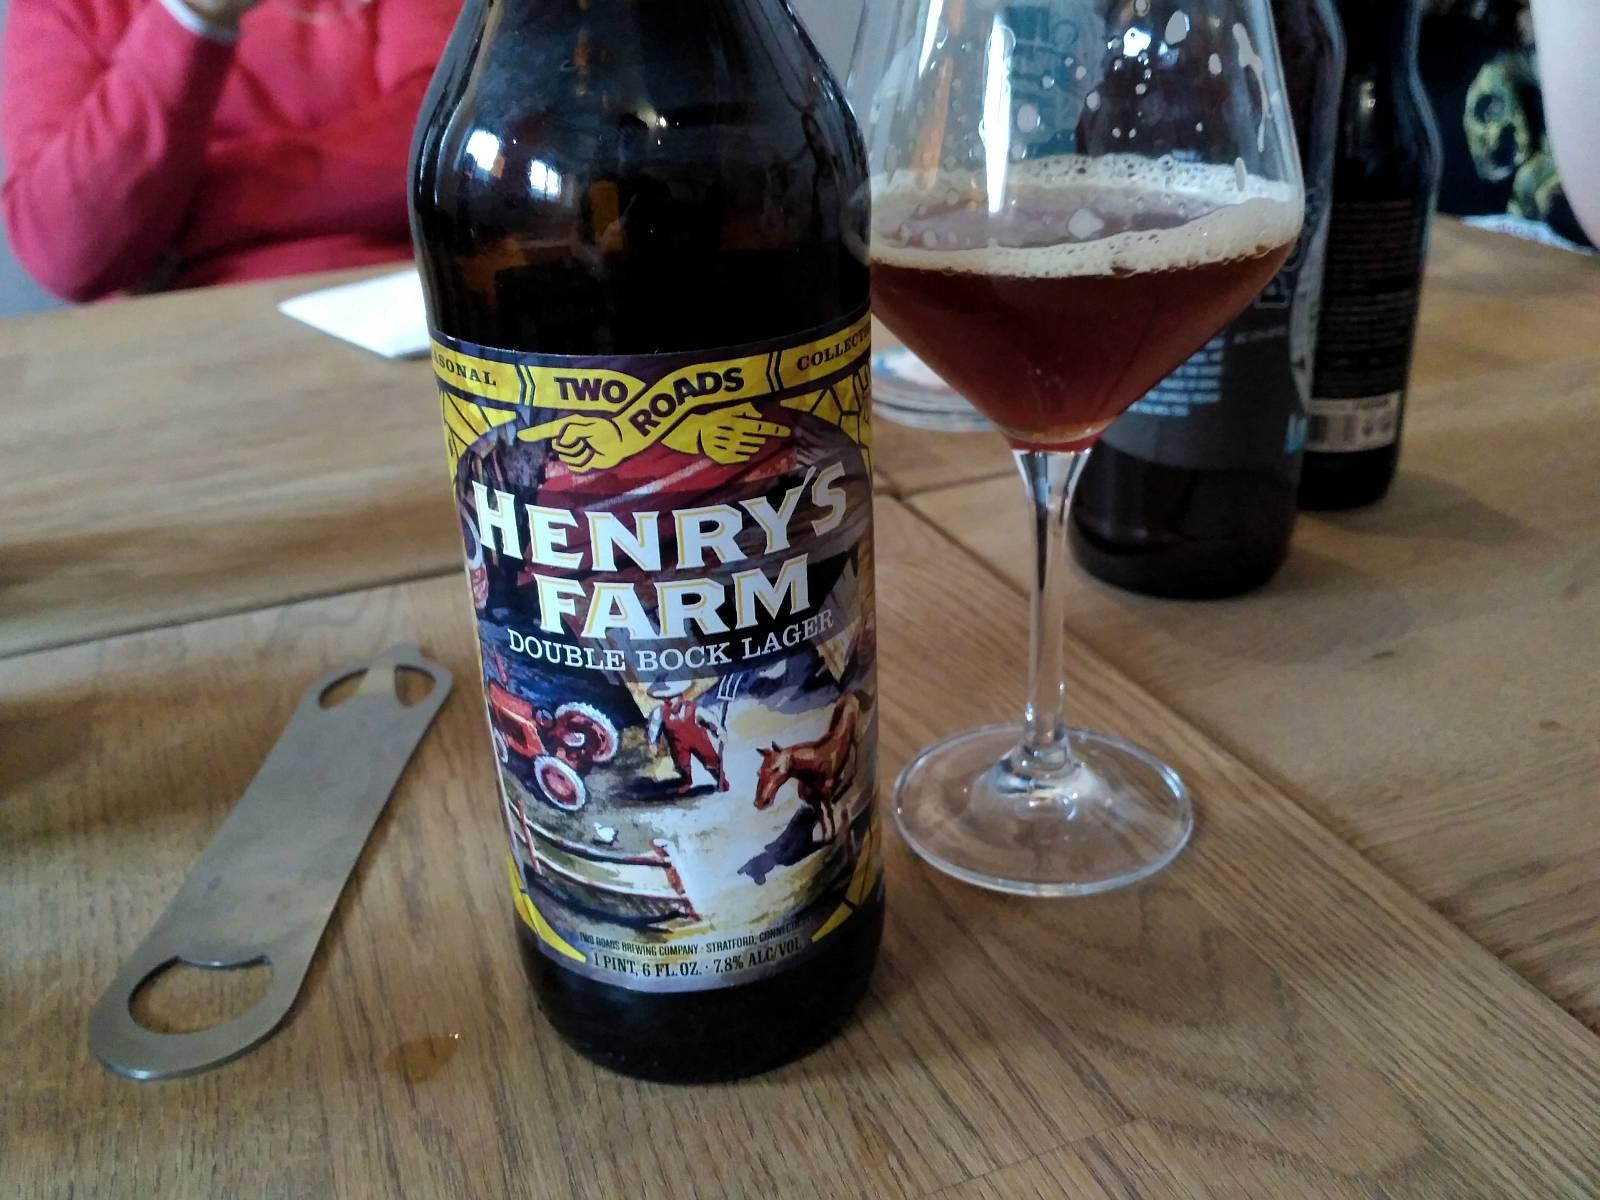 henrys-farm-double-bock-lager-recenzja